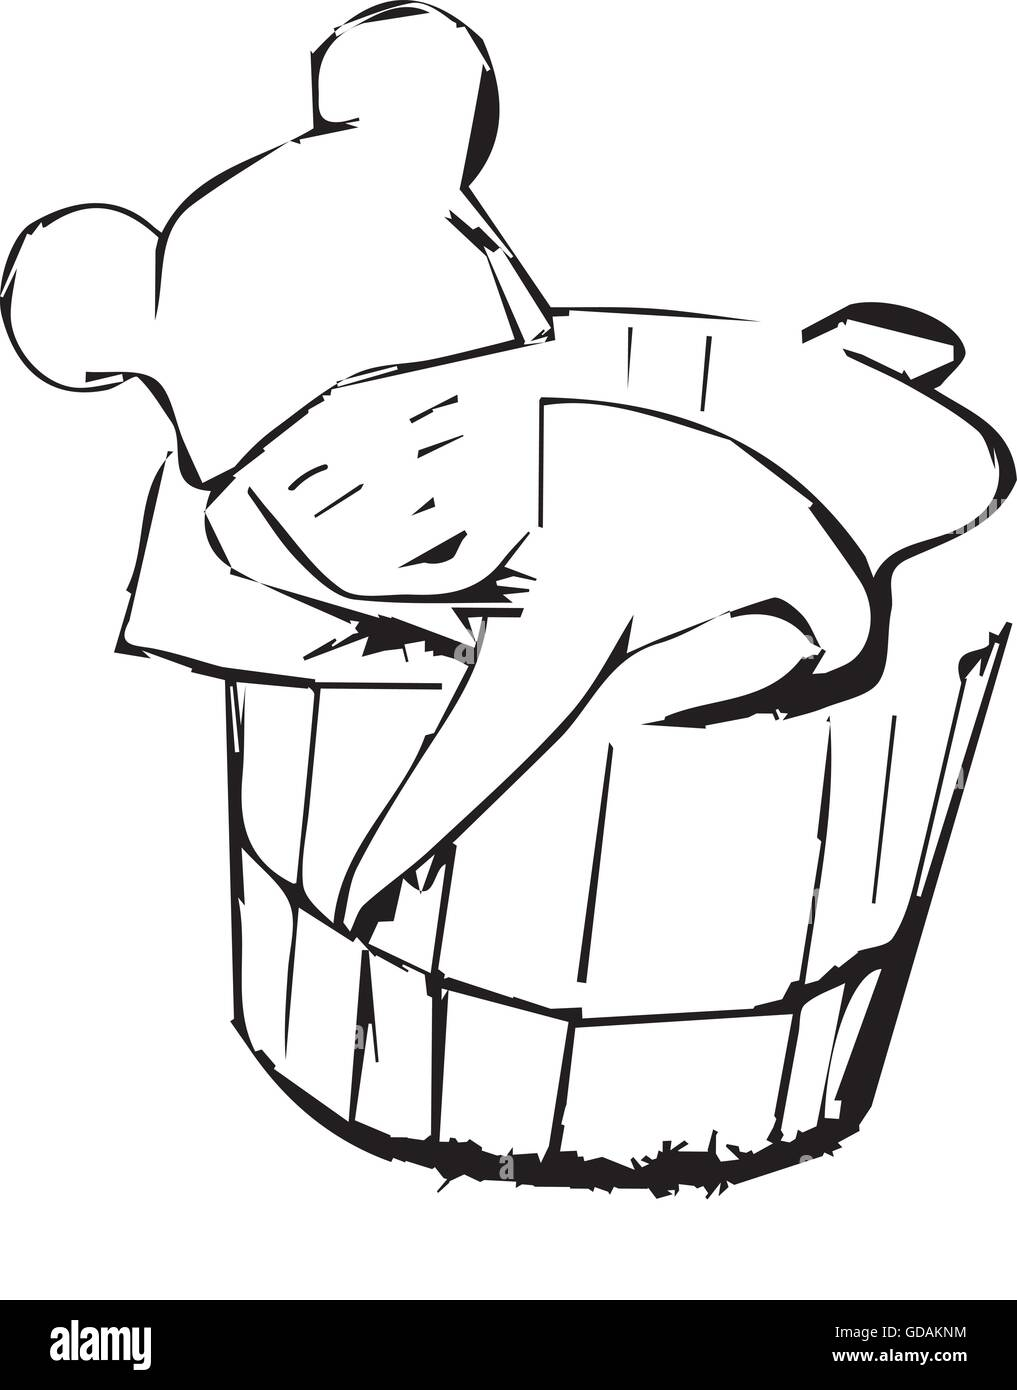 baby wearing a cap sitting in bucket - Stock Vector